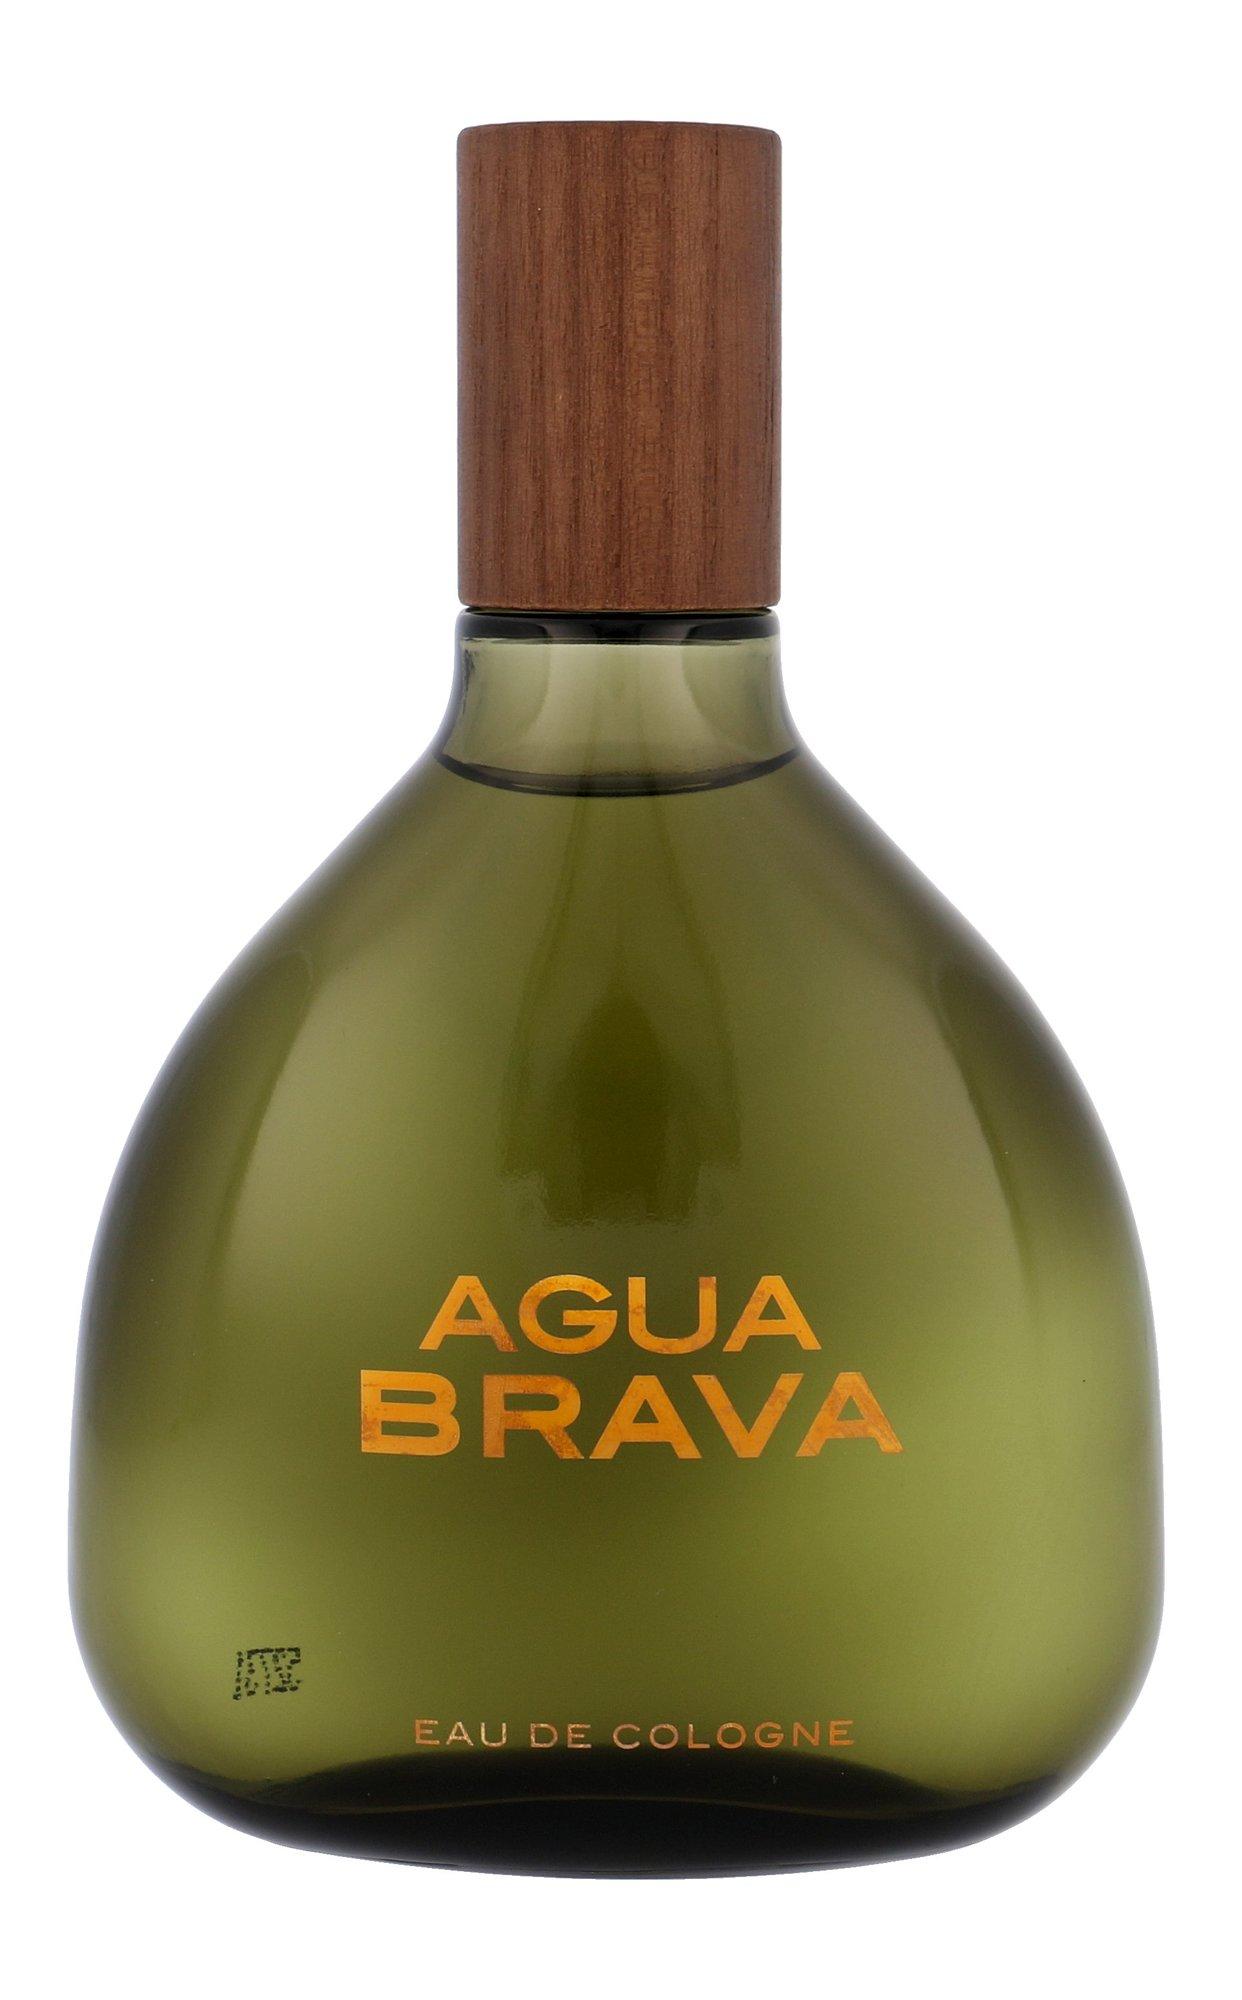 Antonio Puig Agua Brava Cologne 200ml